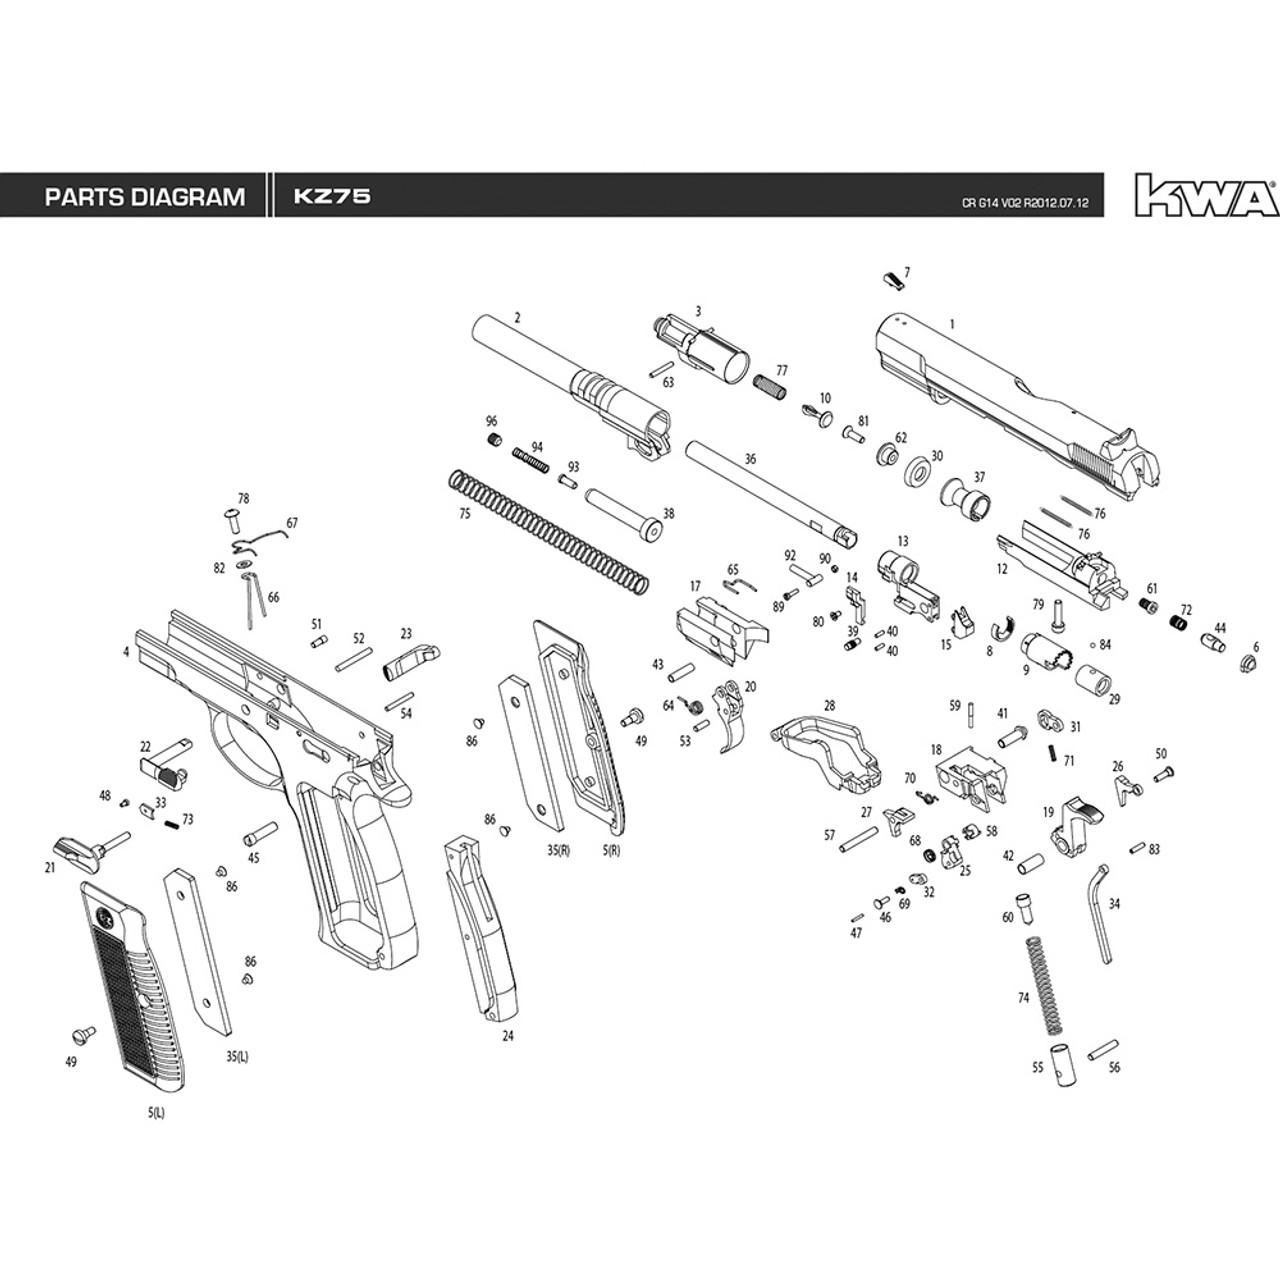 small resolution of kwa airsoft kz75 pistol diagram